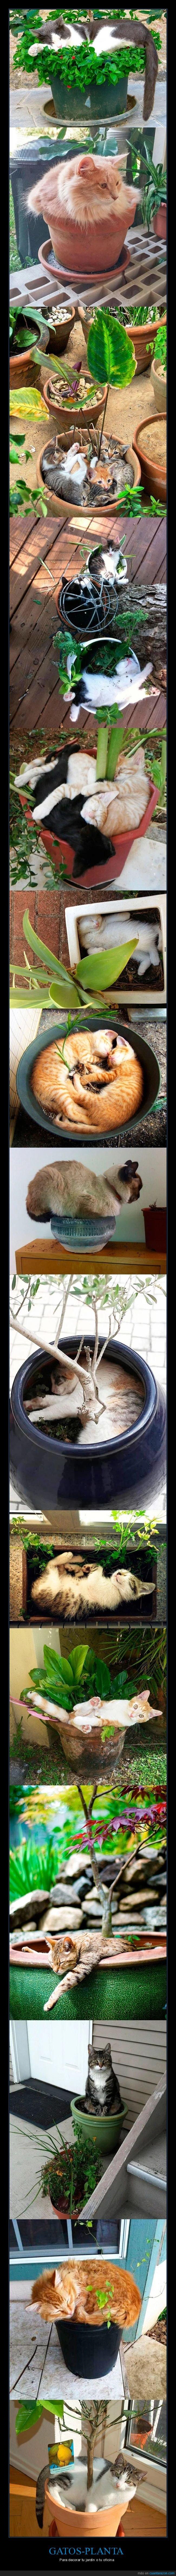 gatos,macetas,plantas